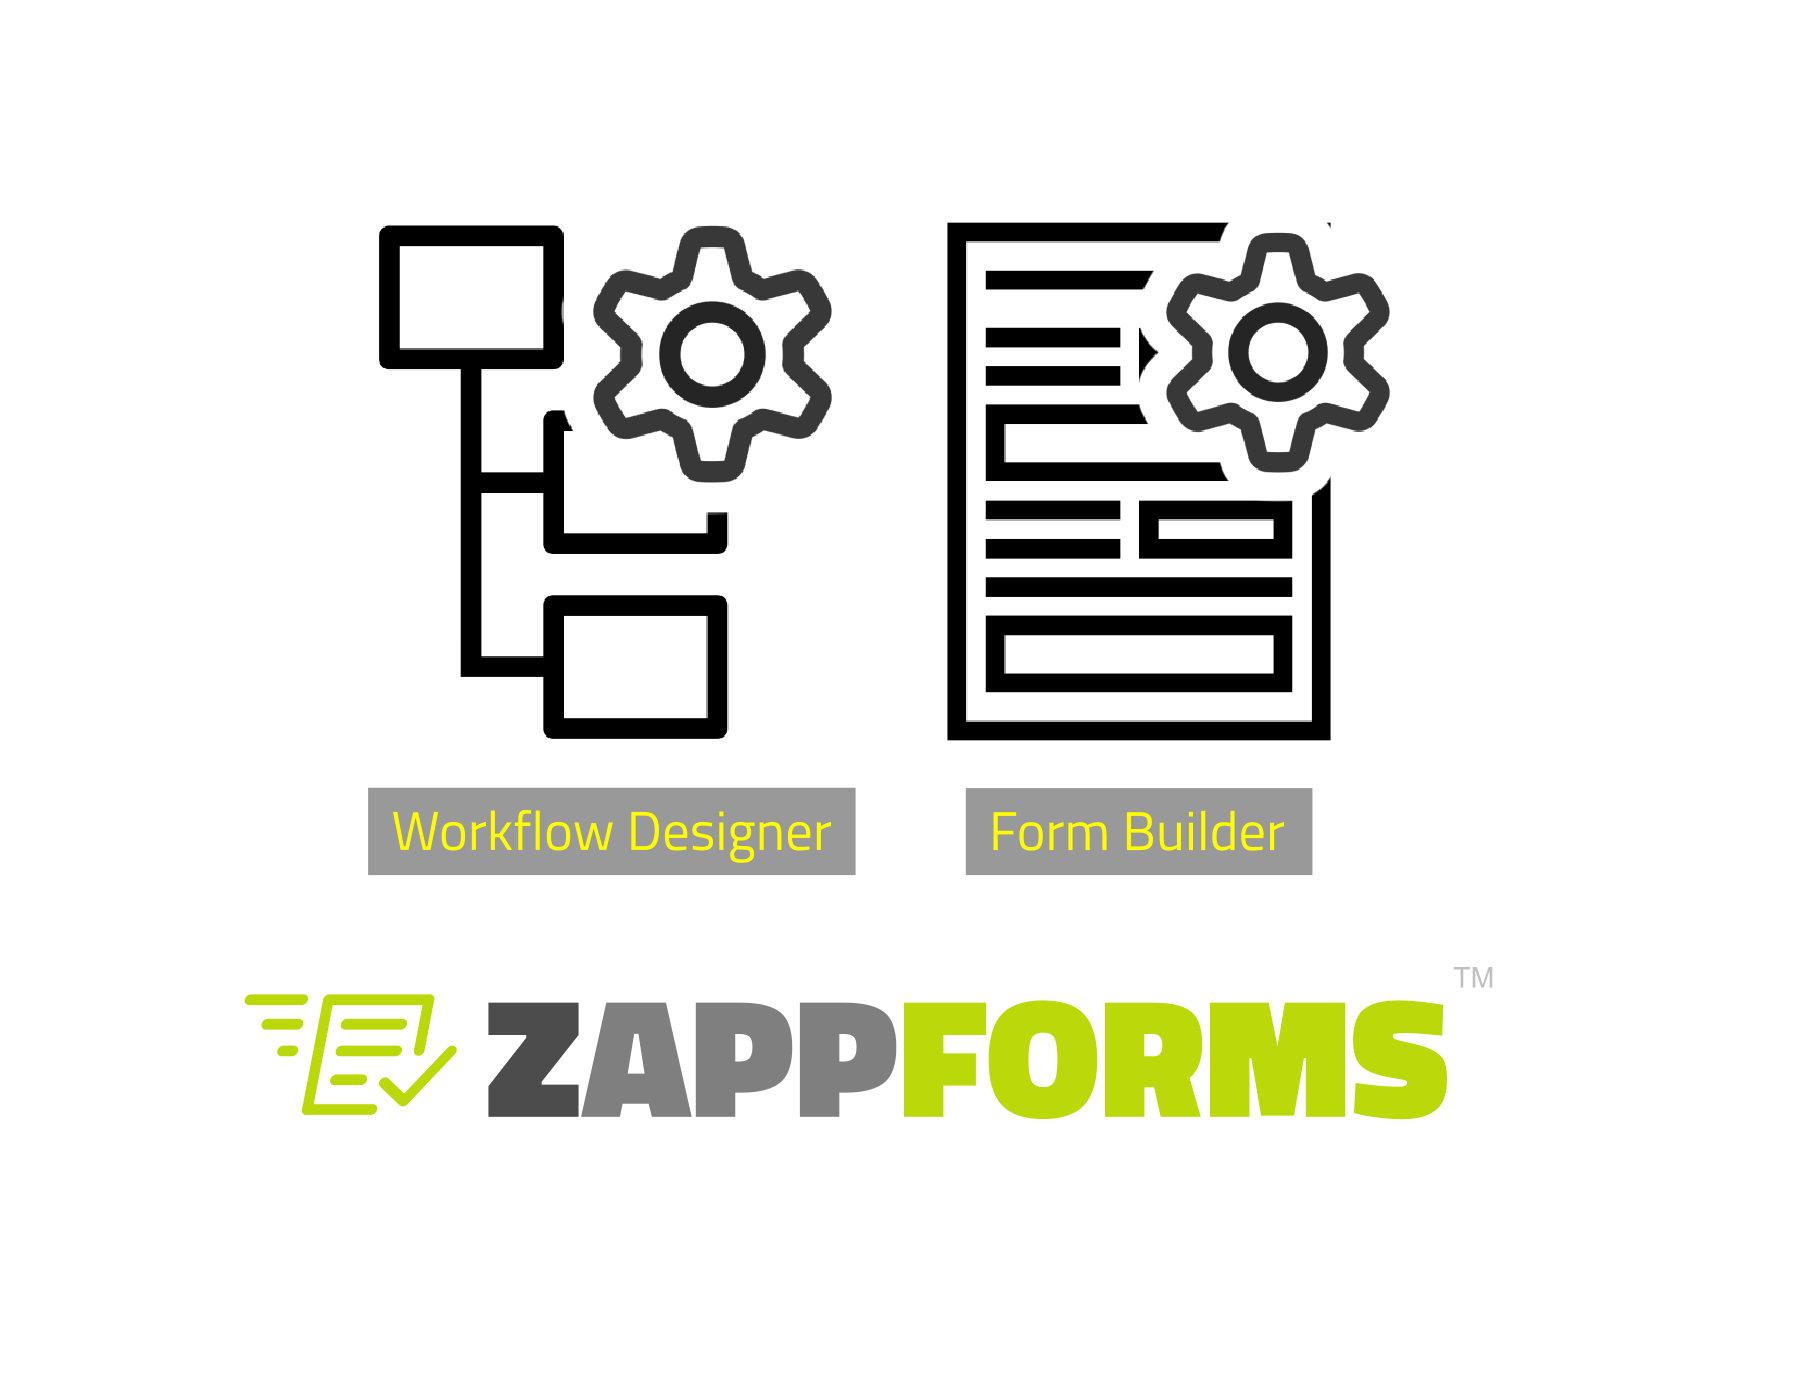 zappforms_illustrate@2x